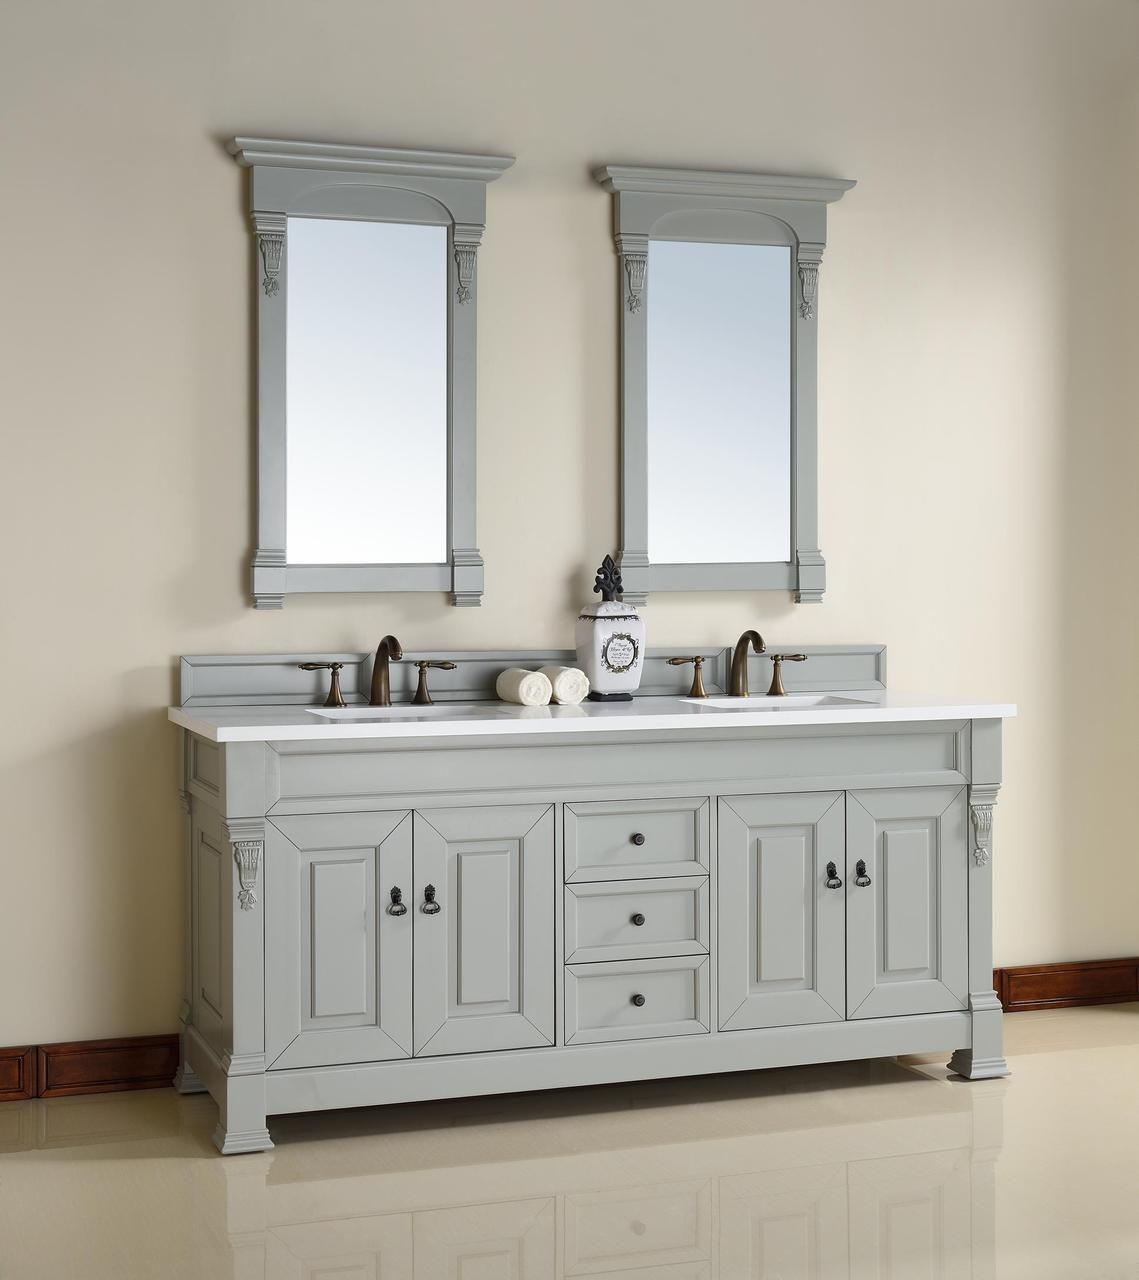 72 Inch Urban Grey Double Bathroom Vanity Optional Countertops